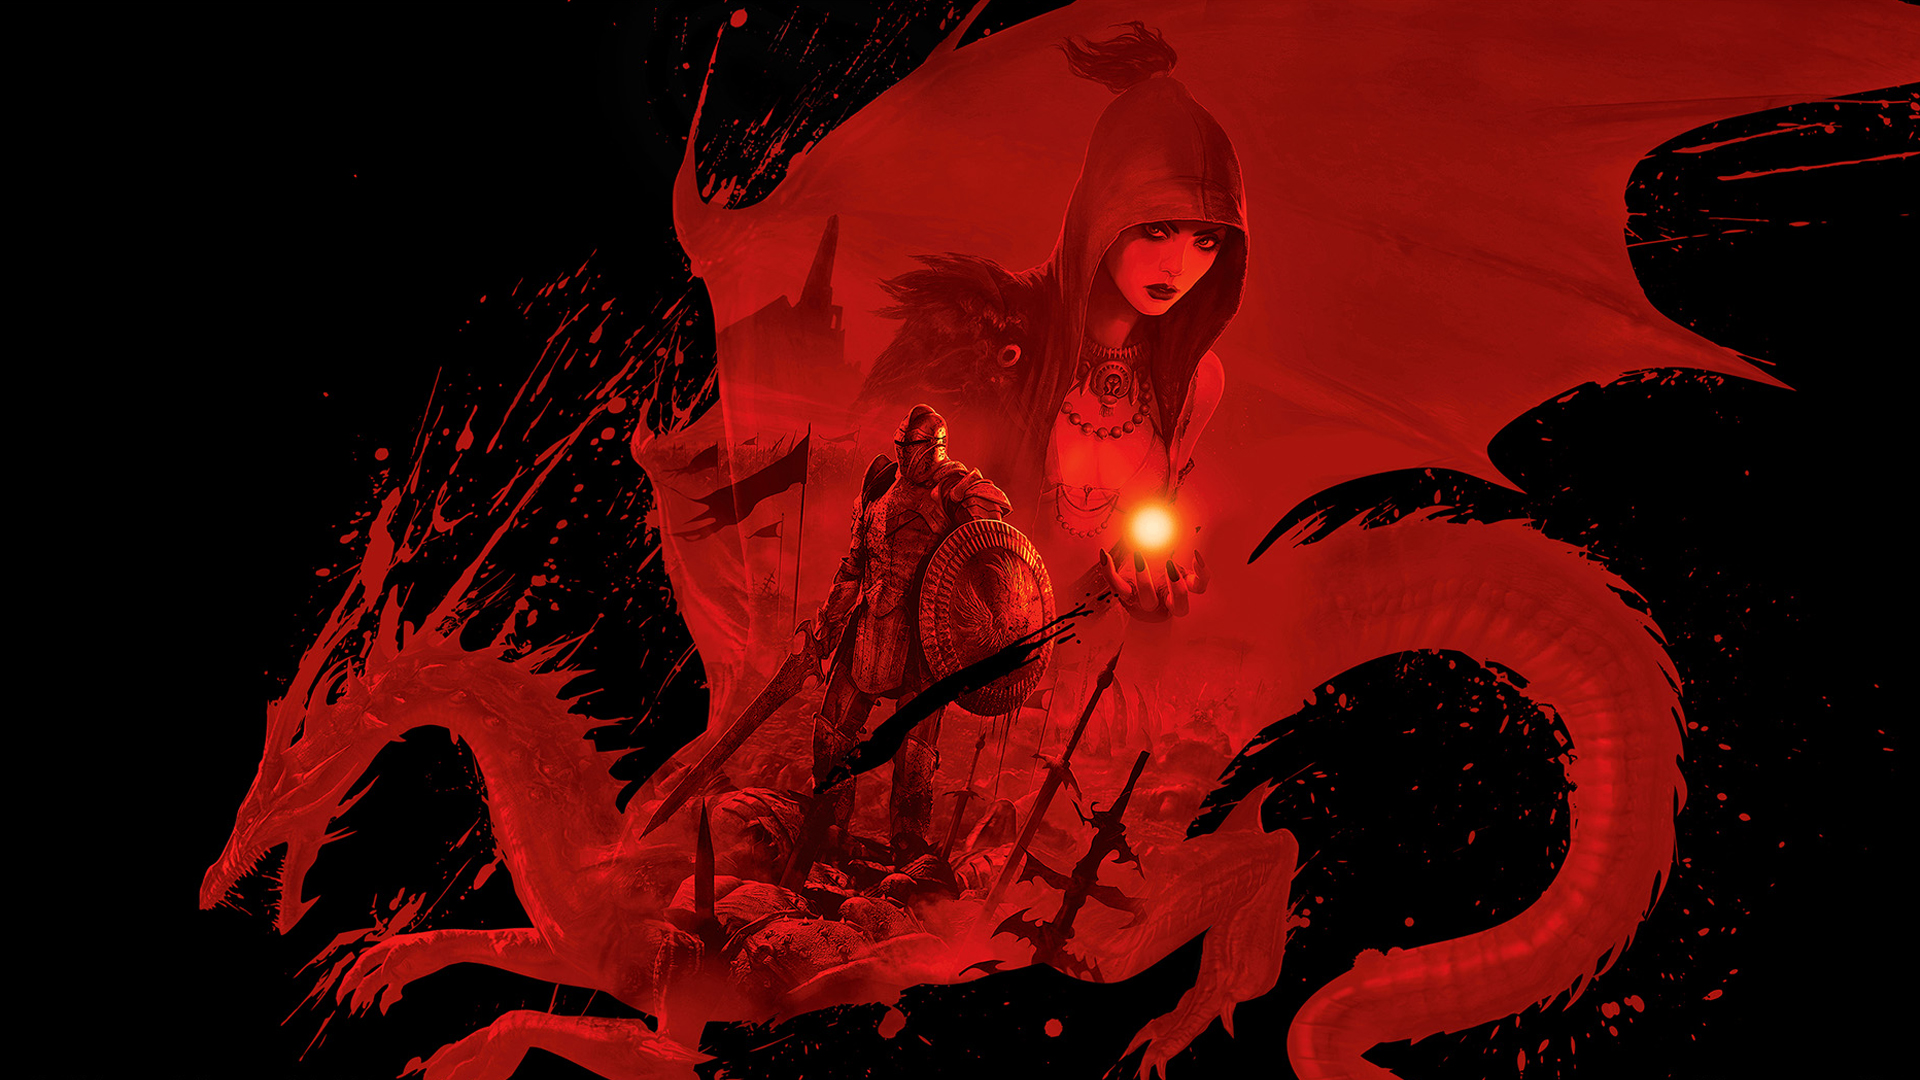 Dragon lore wallpaper wallpapersafari - Dragon Age Wallpaper